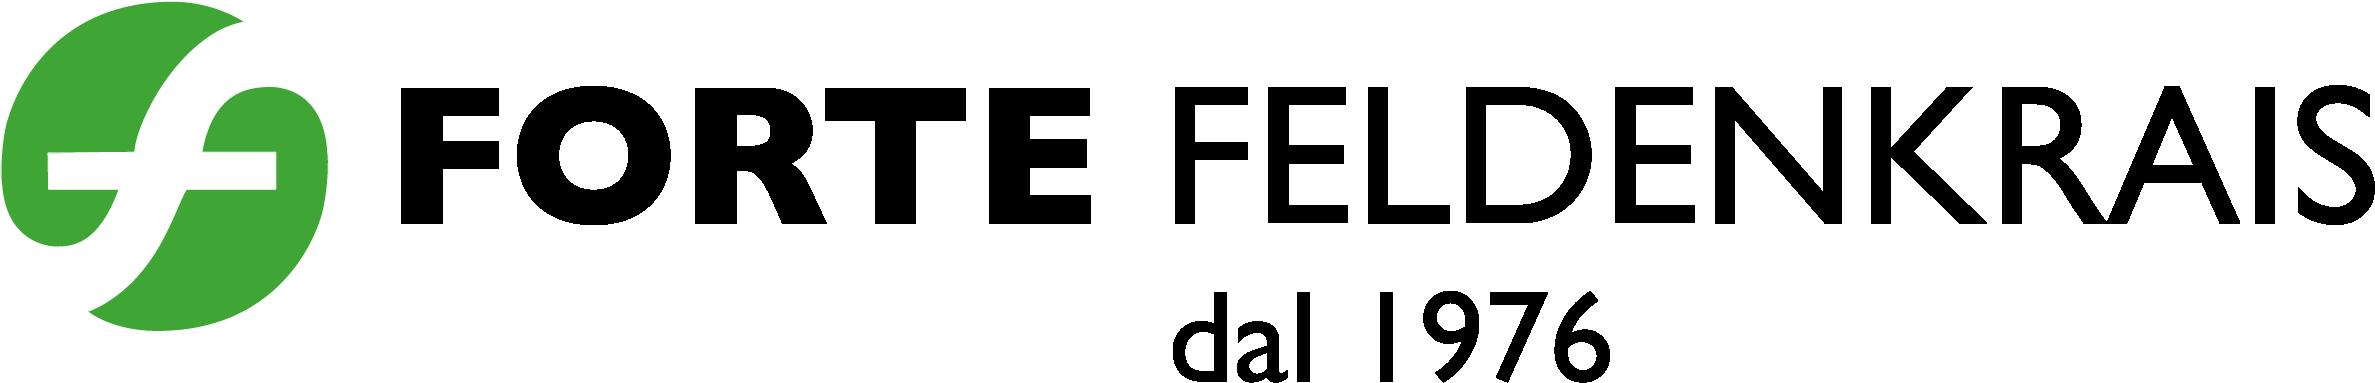 fortefeldenkrais